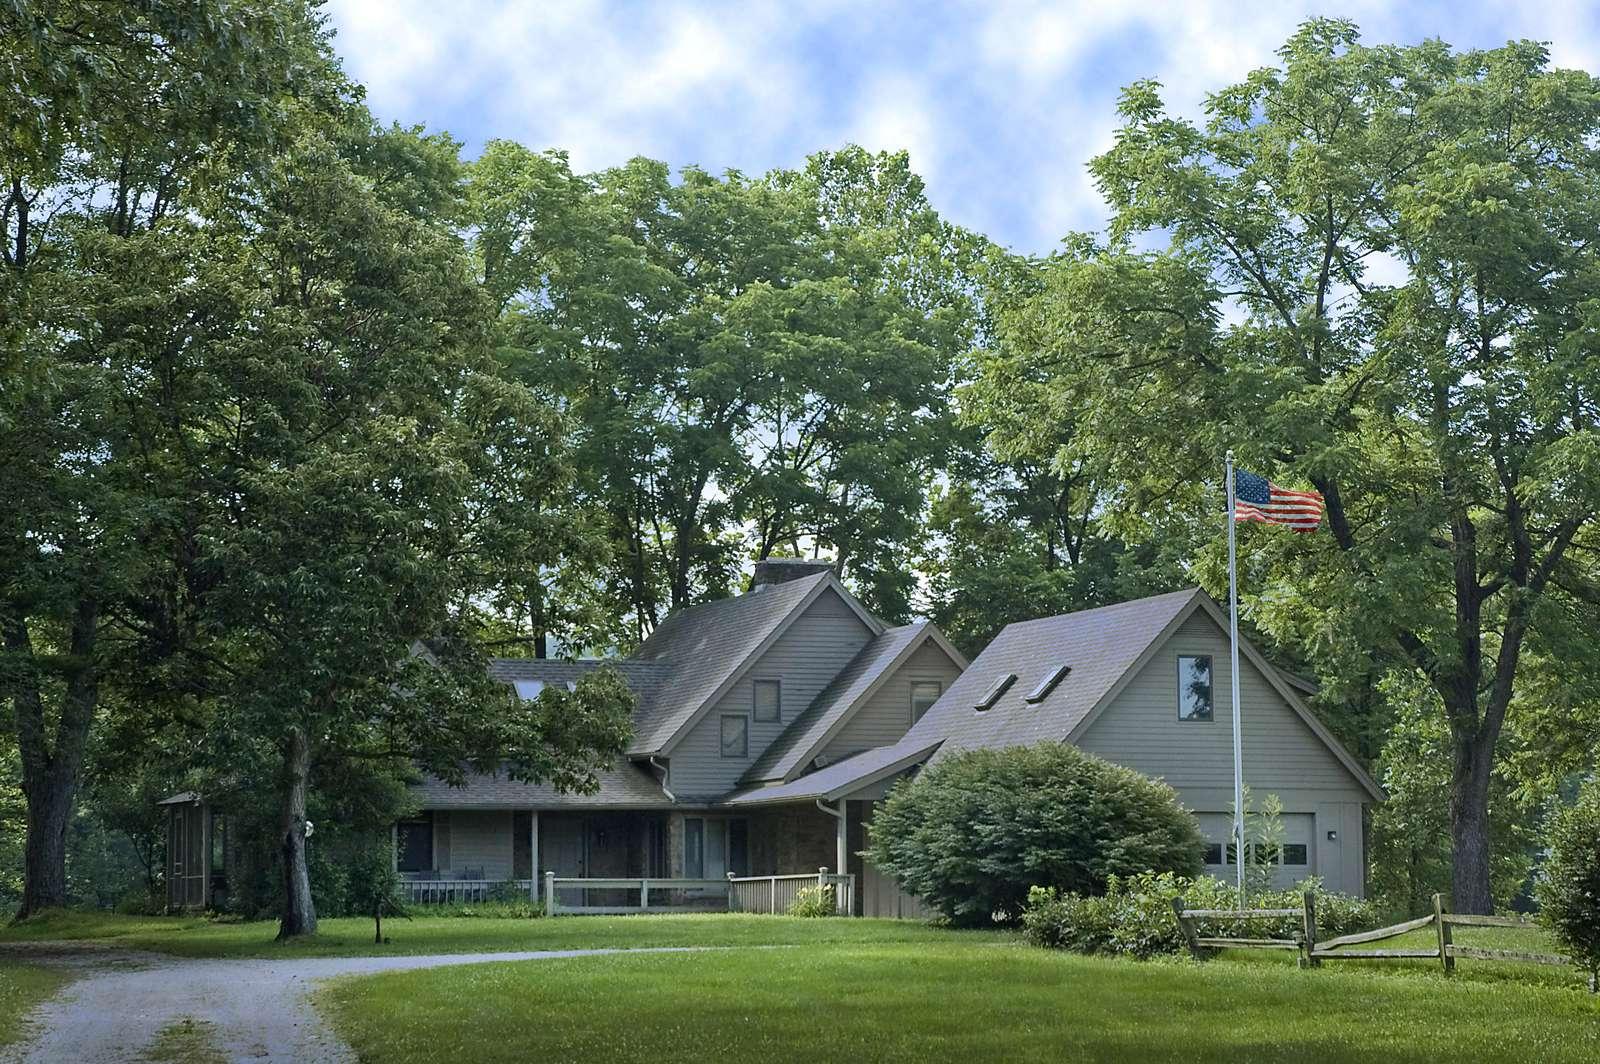 Turkey Ridge Vacation Cabin - property